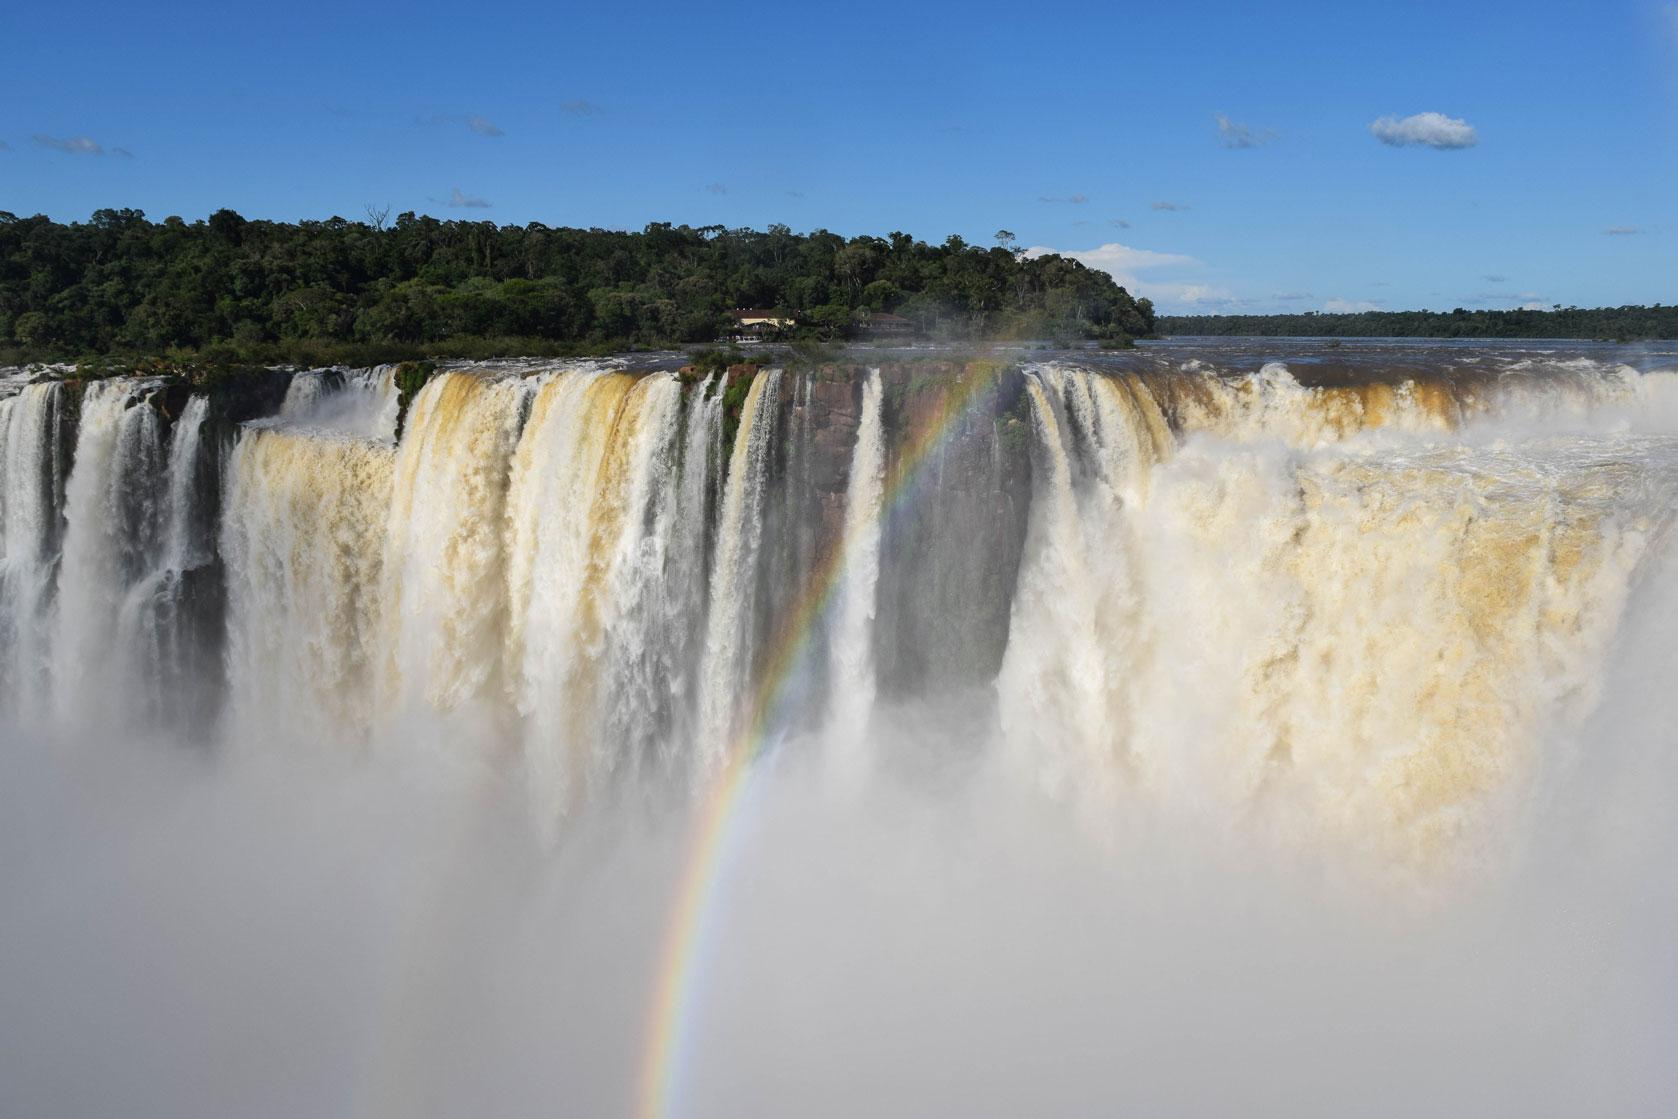 Iguazu Falls - the seventh wonder of the world, Argentina